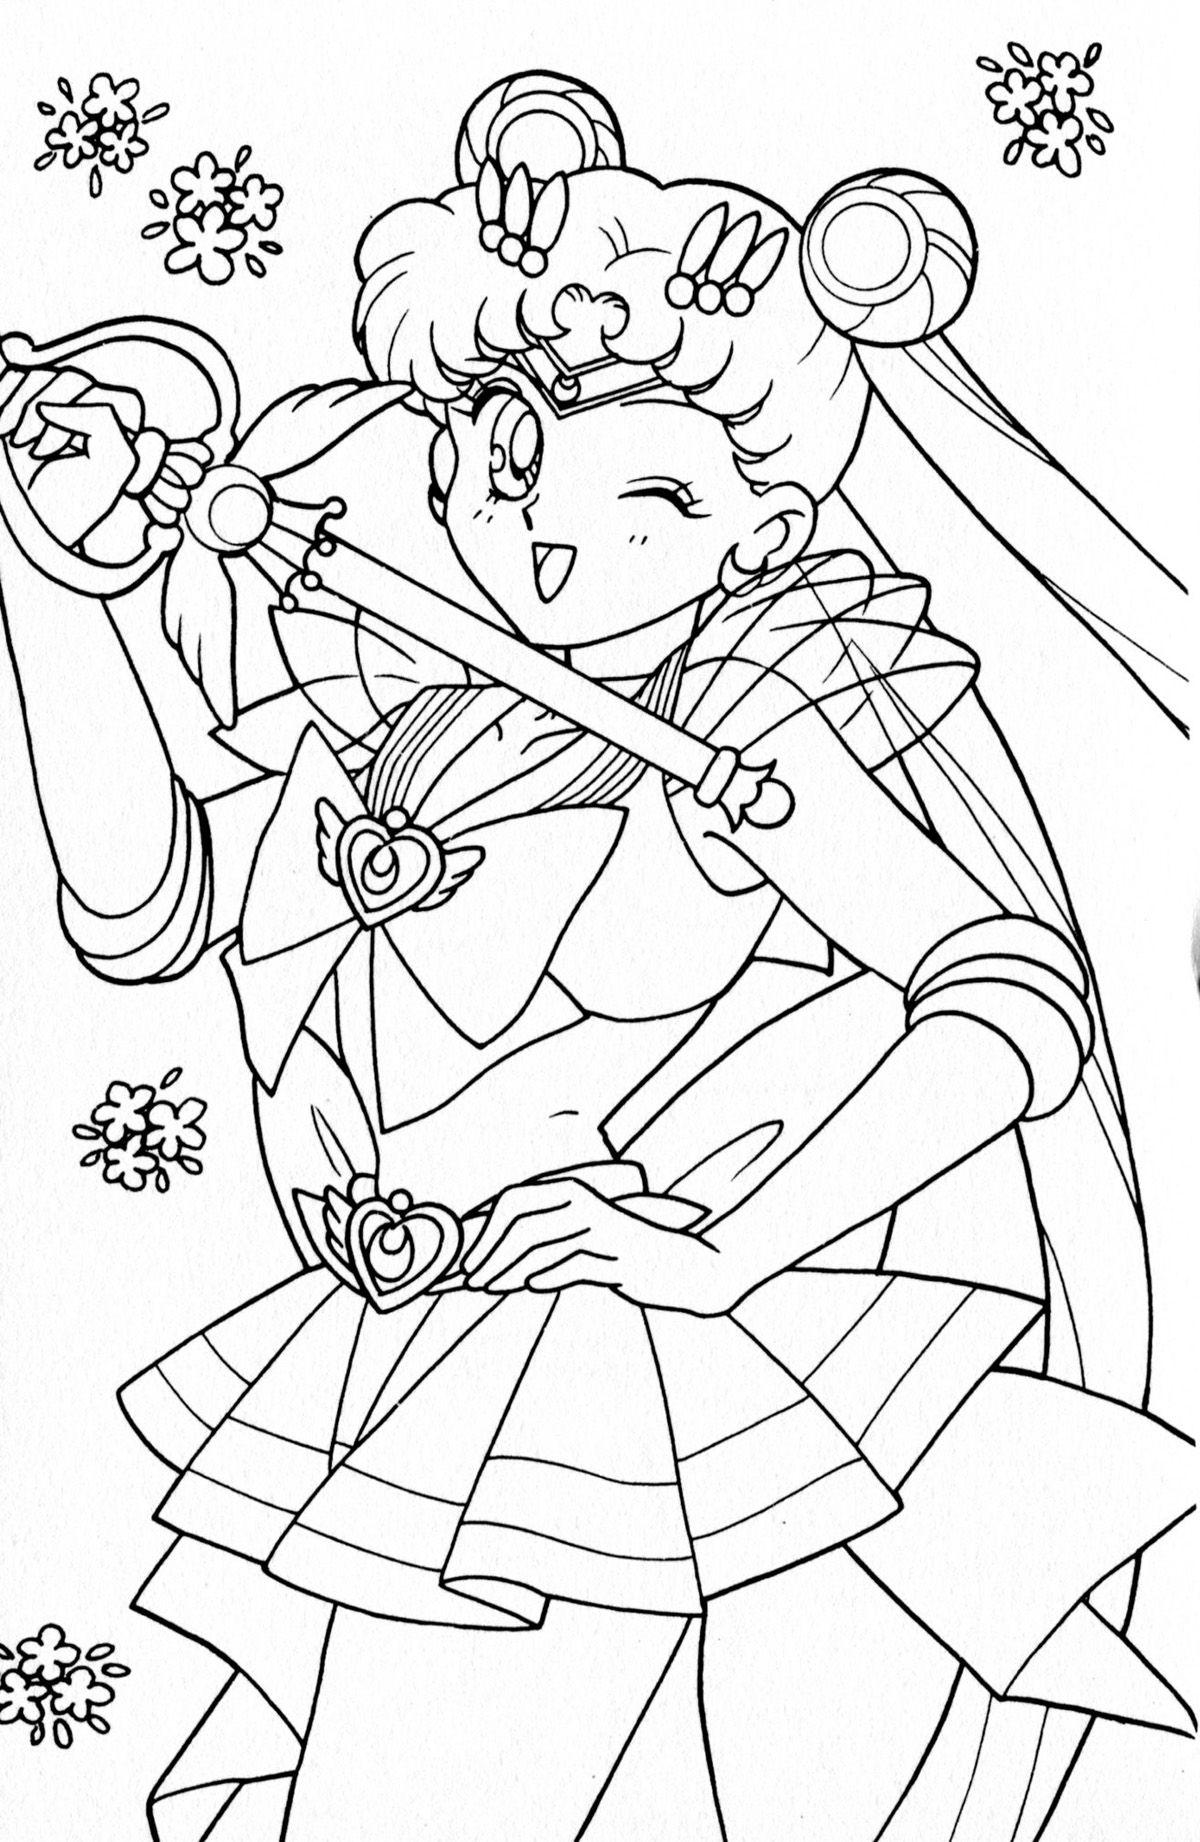 silvermoon424 - Single User Dash | LineArt: Sailor Moon | Pinterest ...